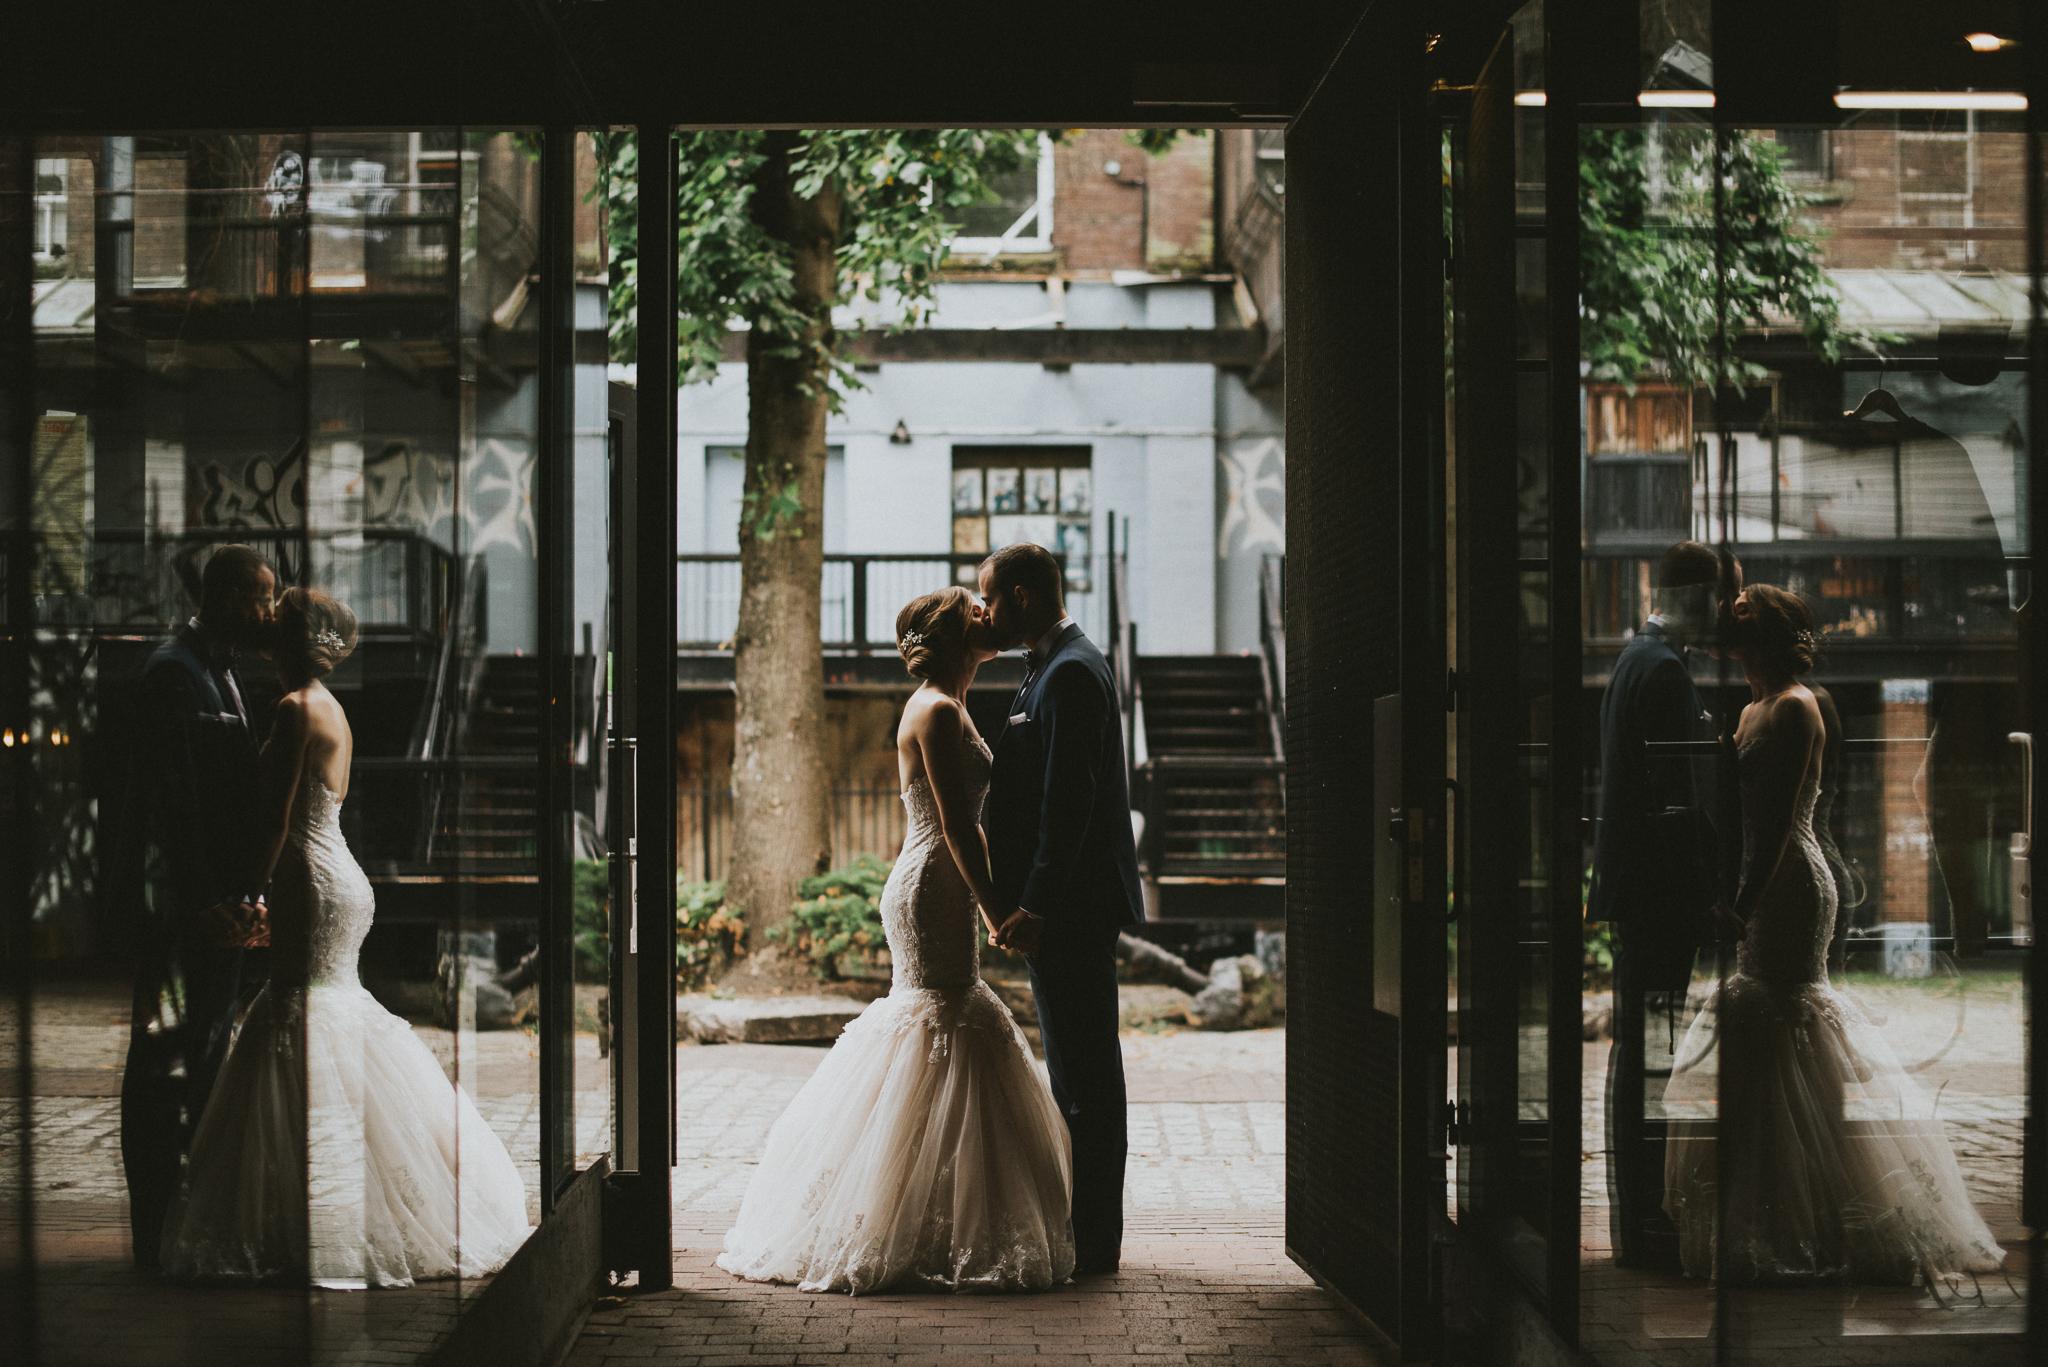 143-permanent-vancouver-wedding-courtneysteven-web-8602.jpg